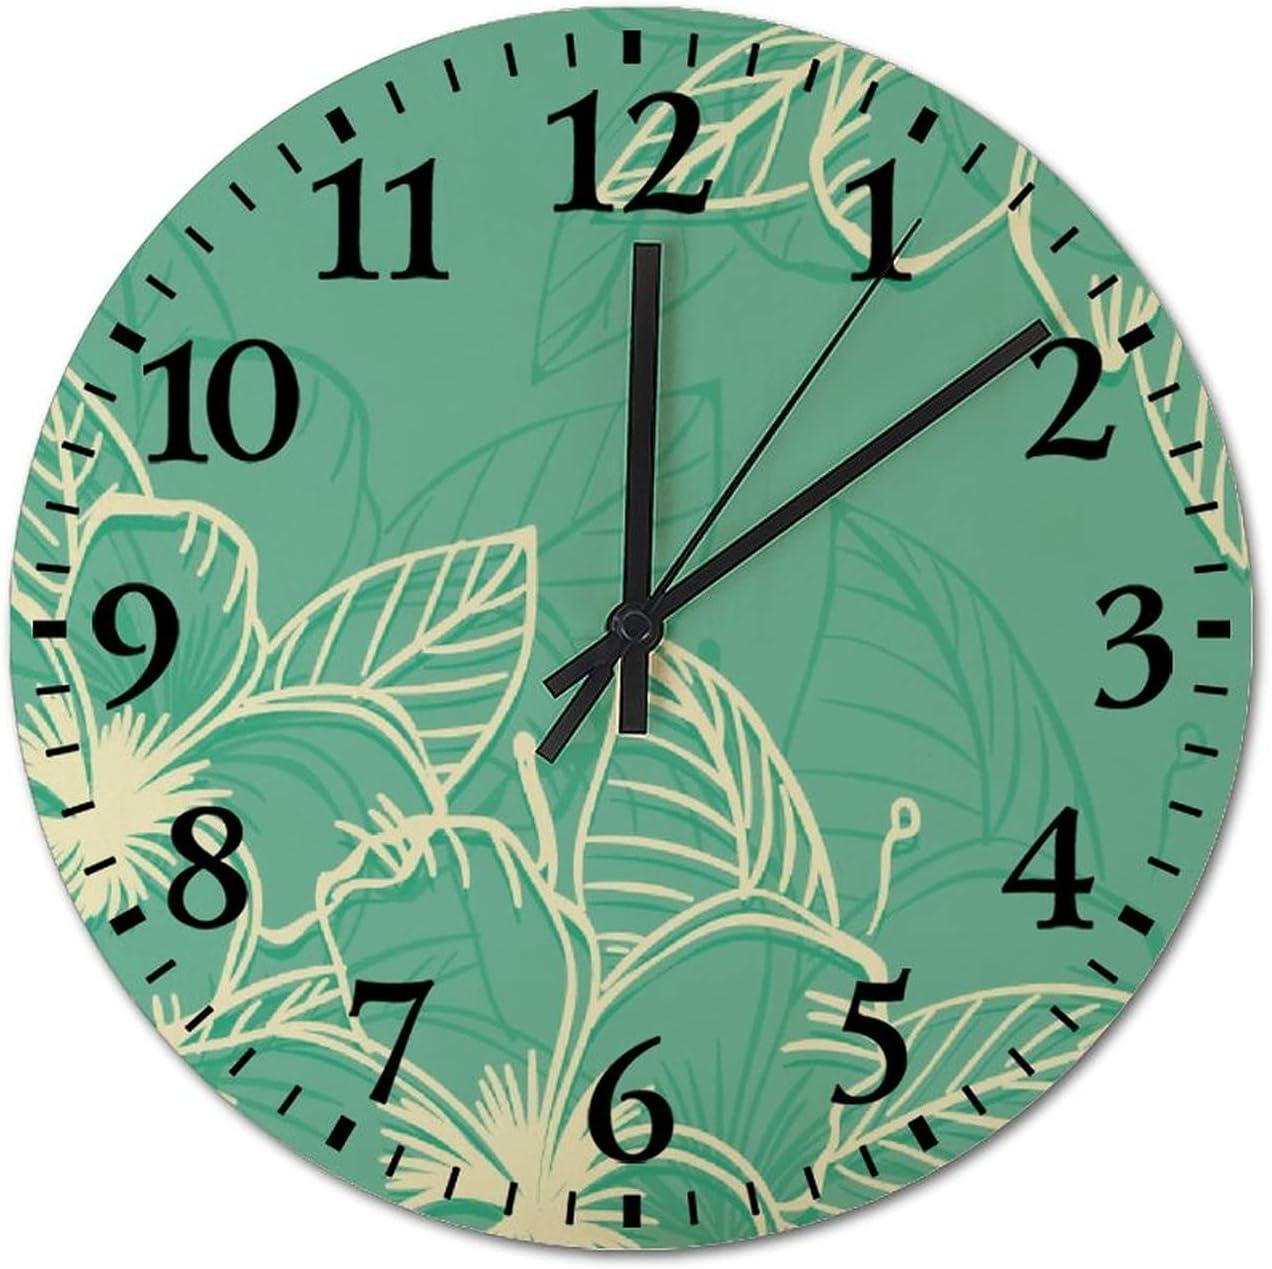 Tropicalplants 12 Inch Modern Wall store Silent Non-Ticking Limited time cheap sale Bat Clock